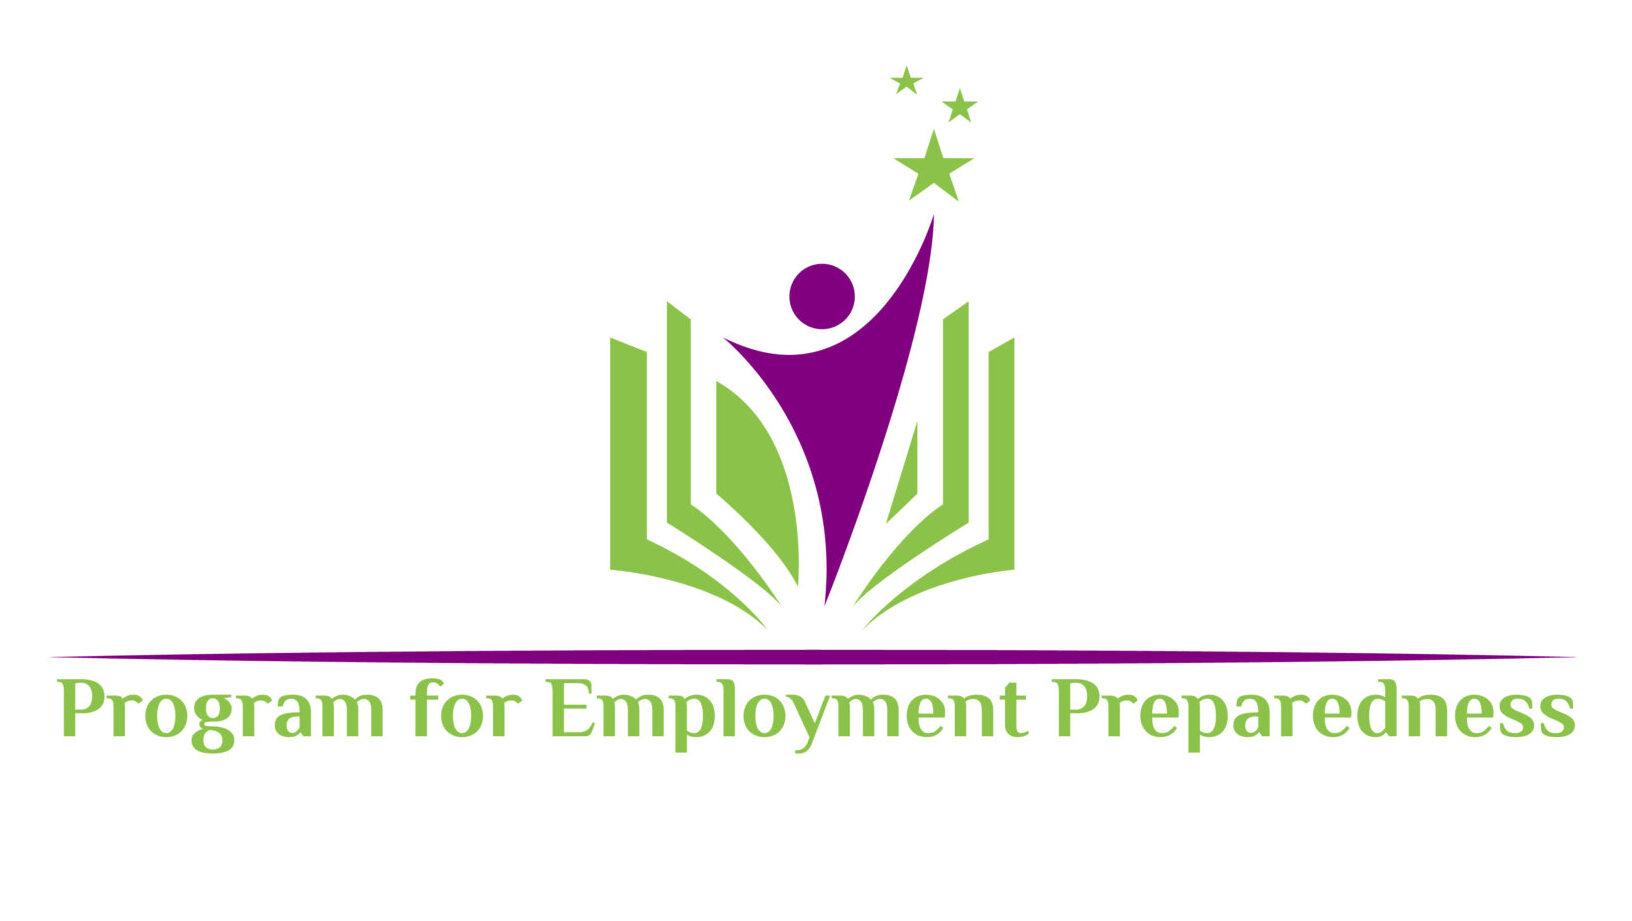 PEP Logo. A person emerges from an open book, reaching towards a star. Text below reads Program for Employment Preparedness.